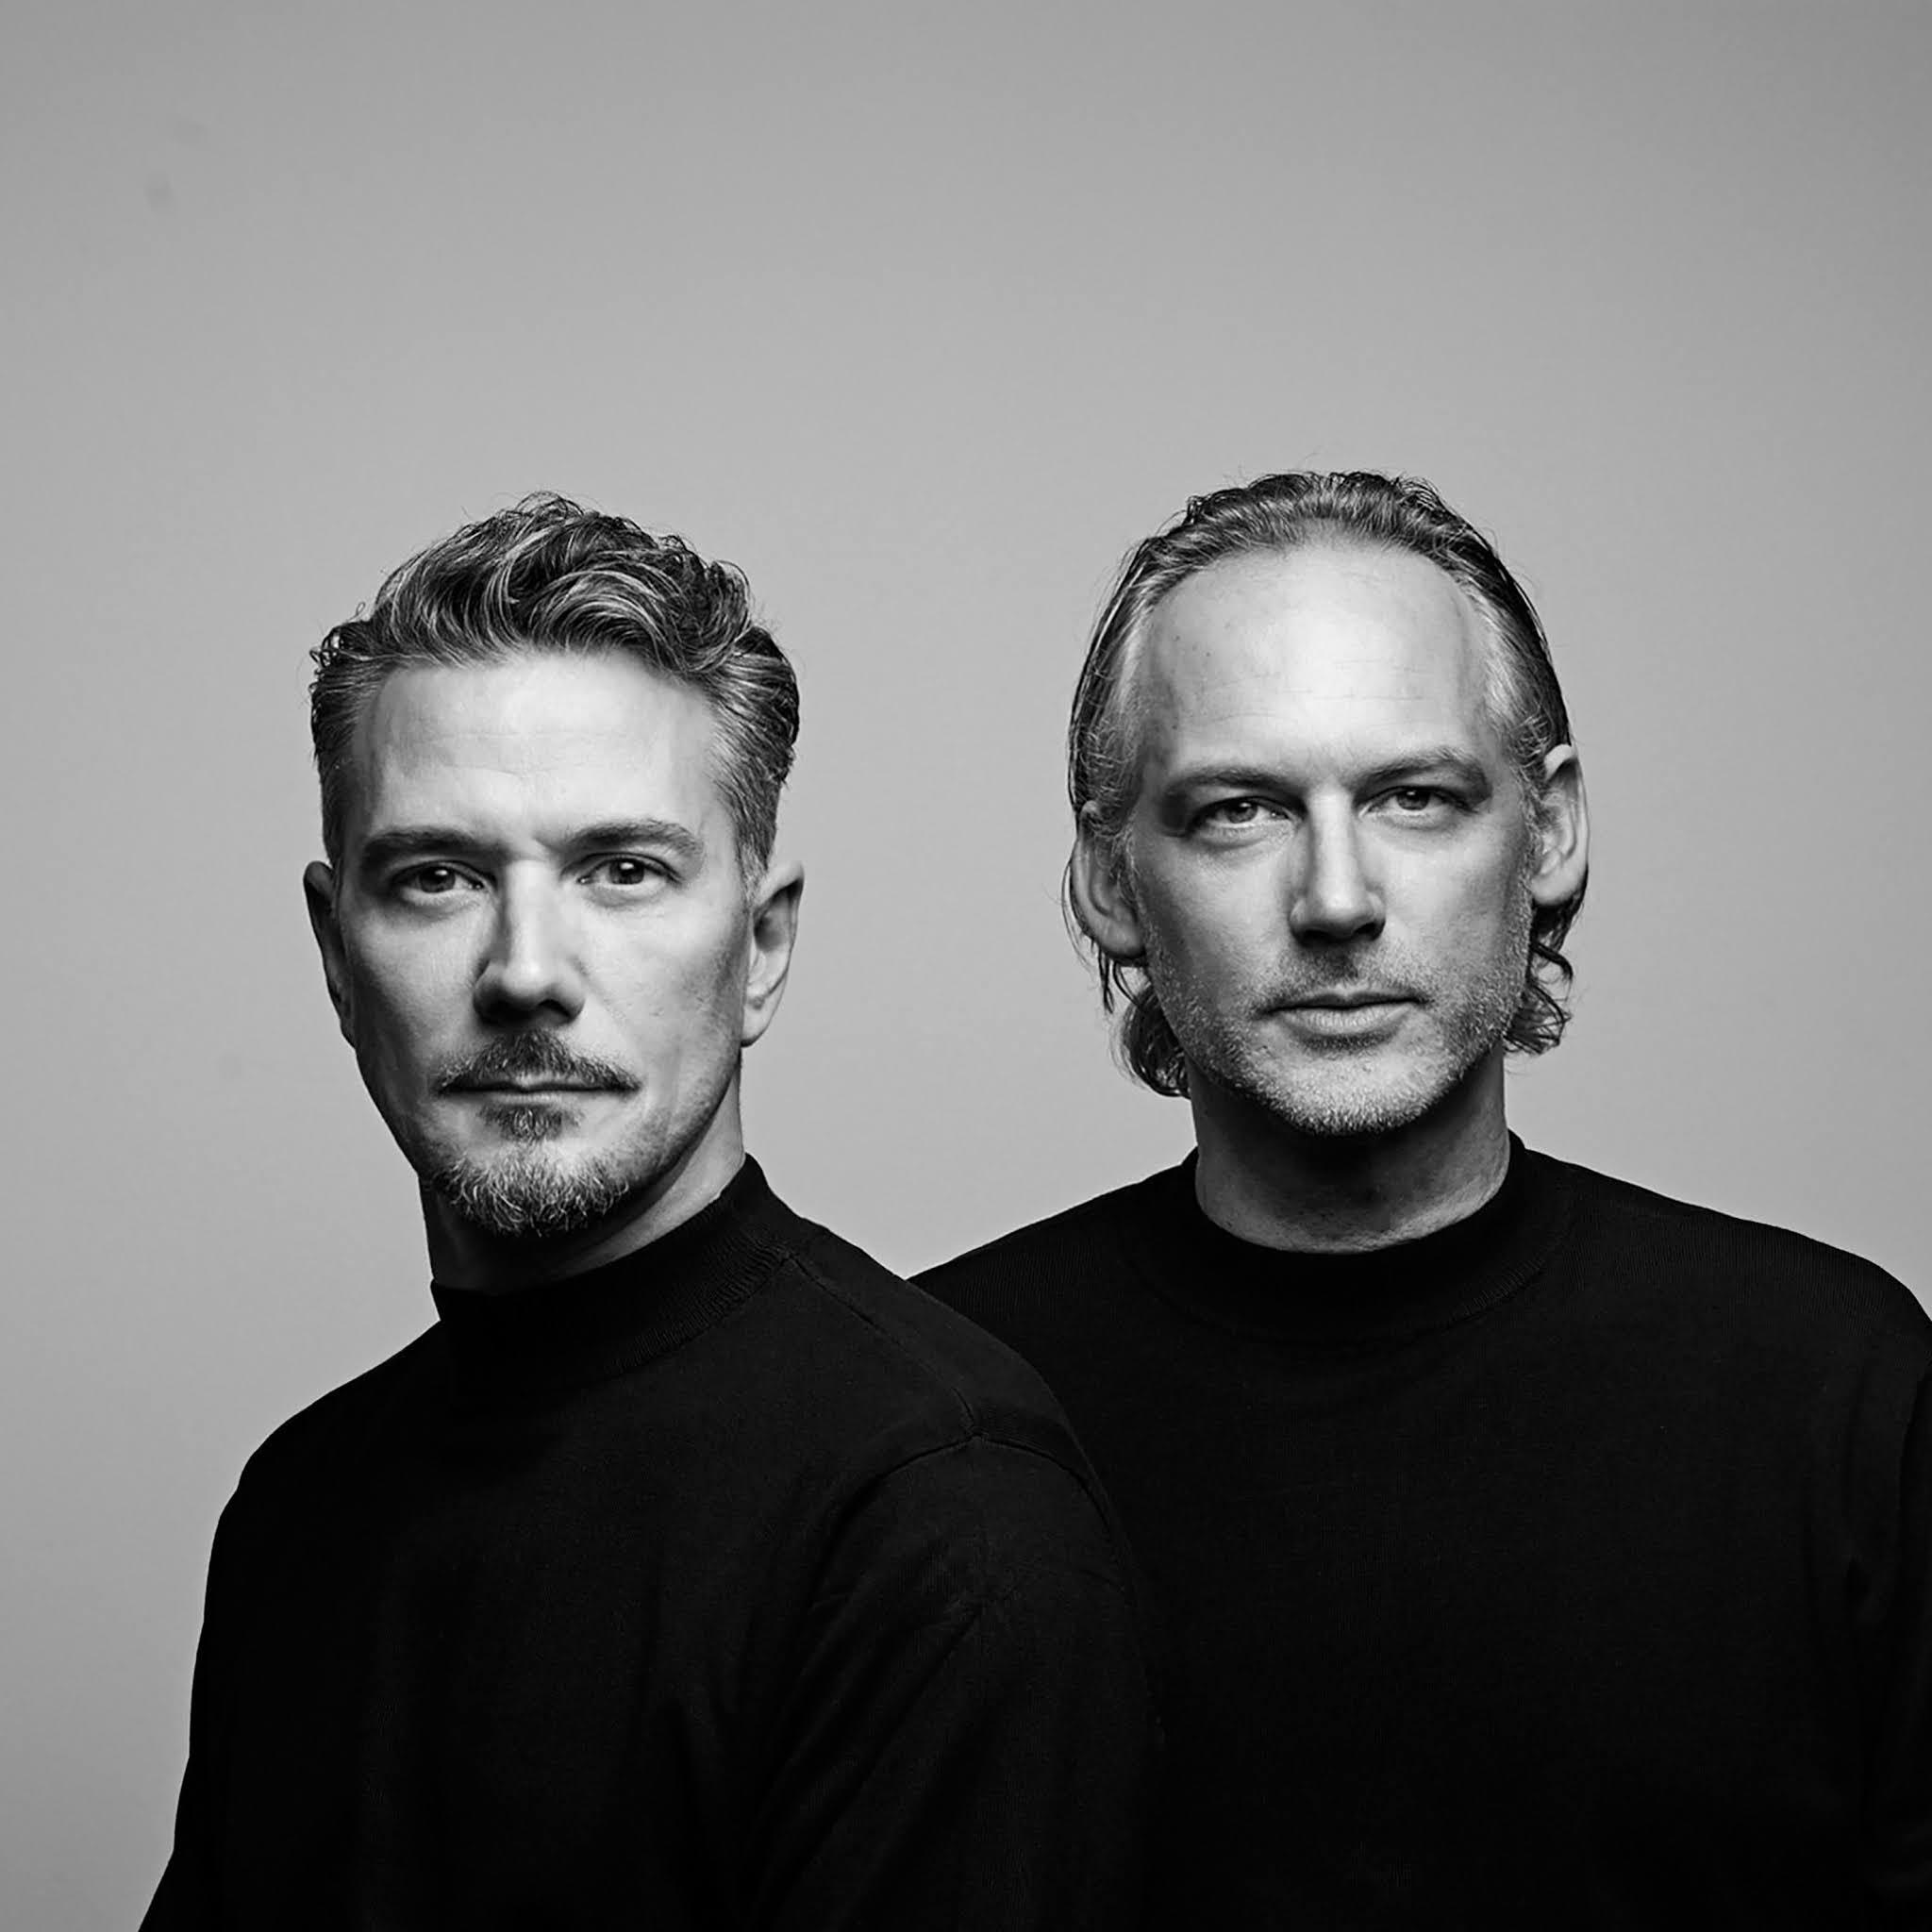 Kruder & Dorfmeister | Credit: Max Parovsky